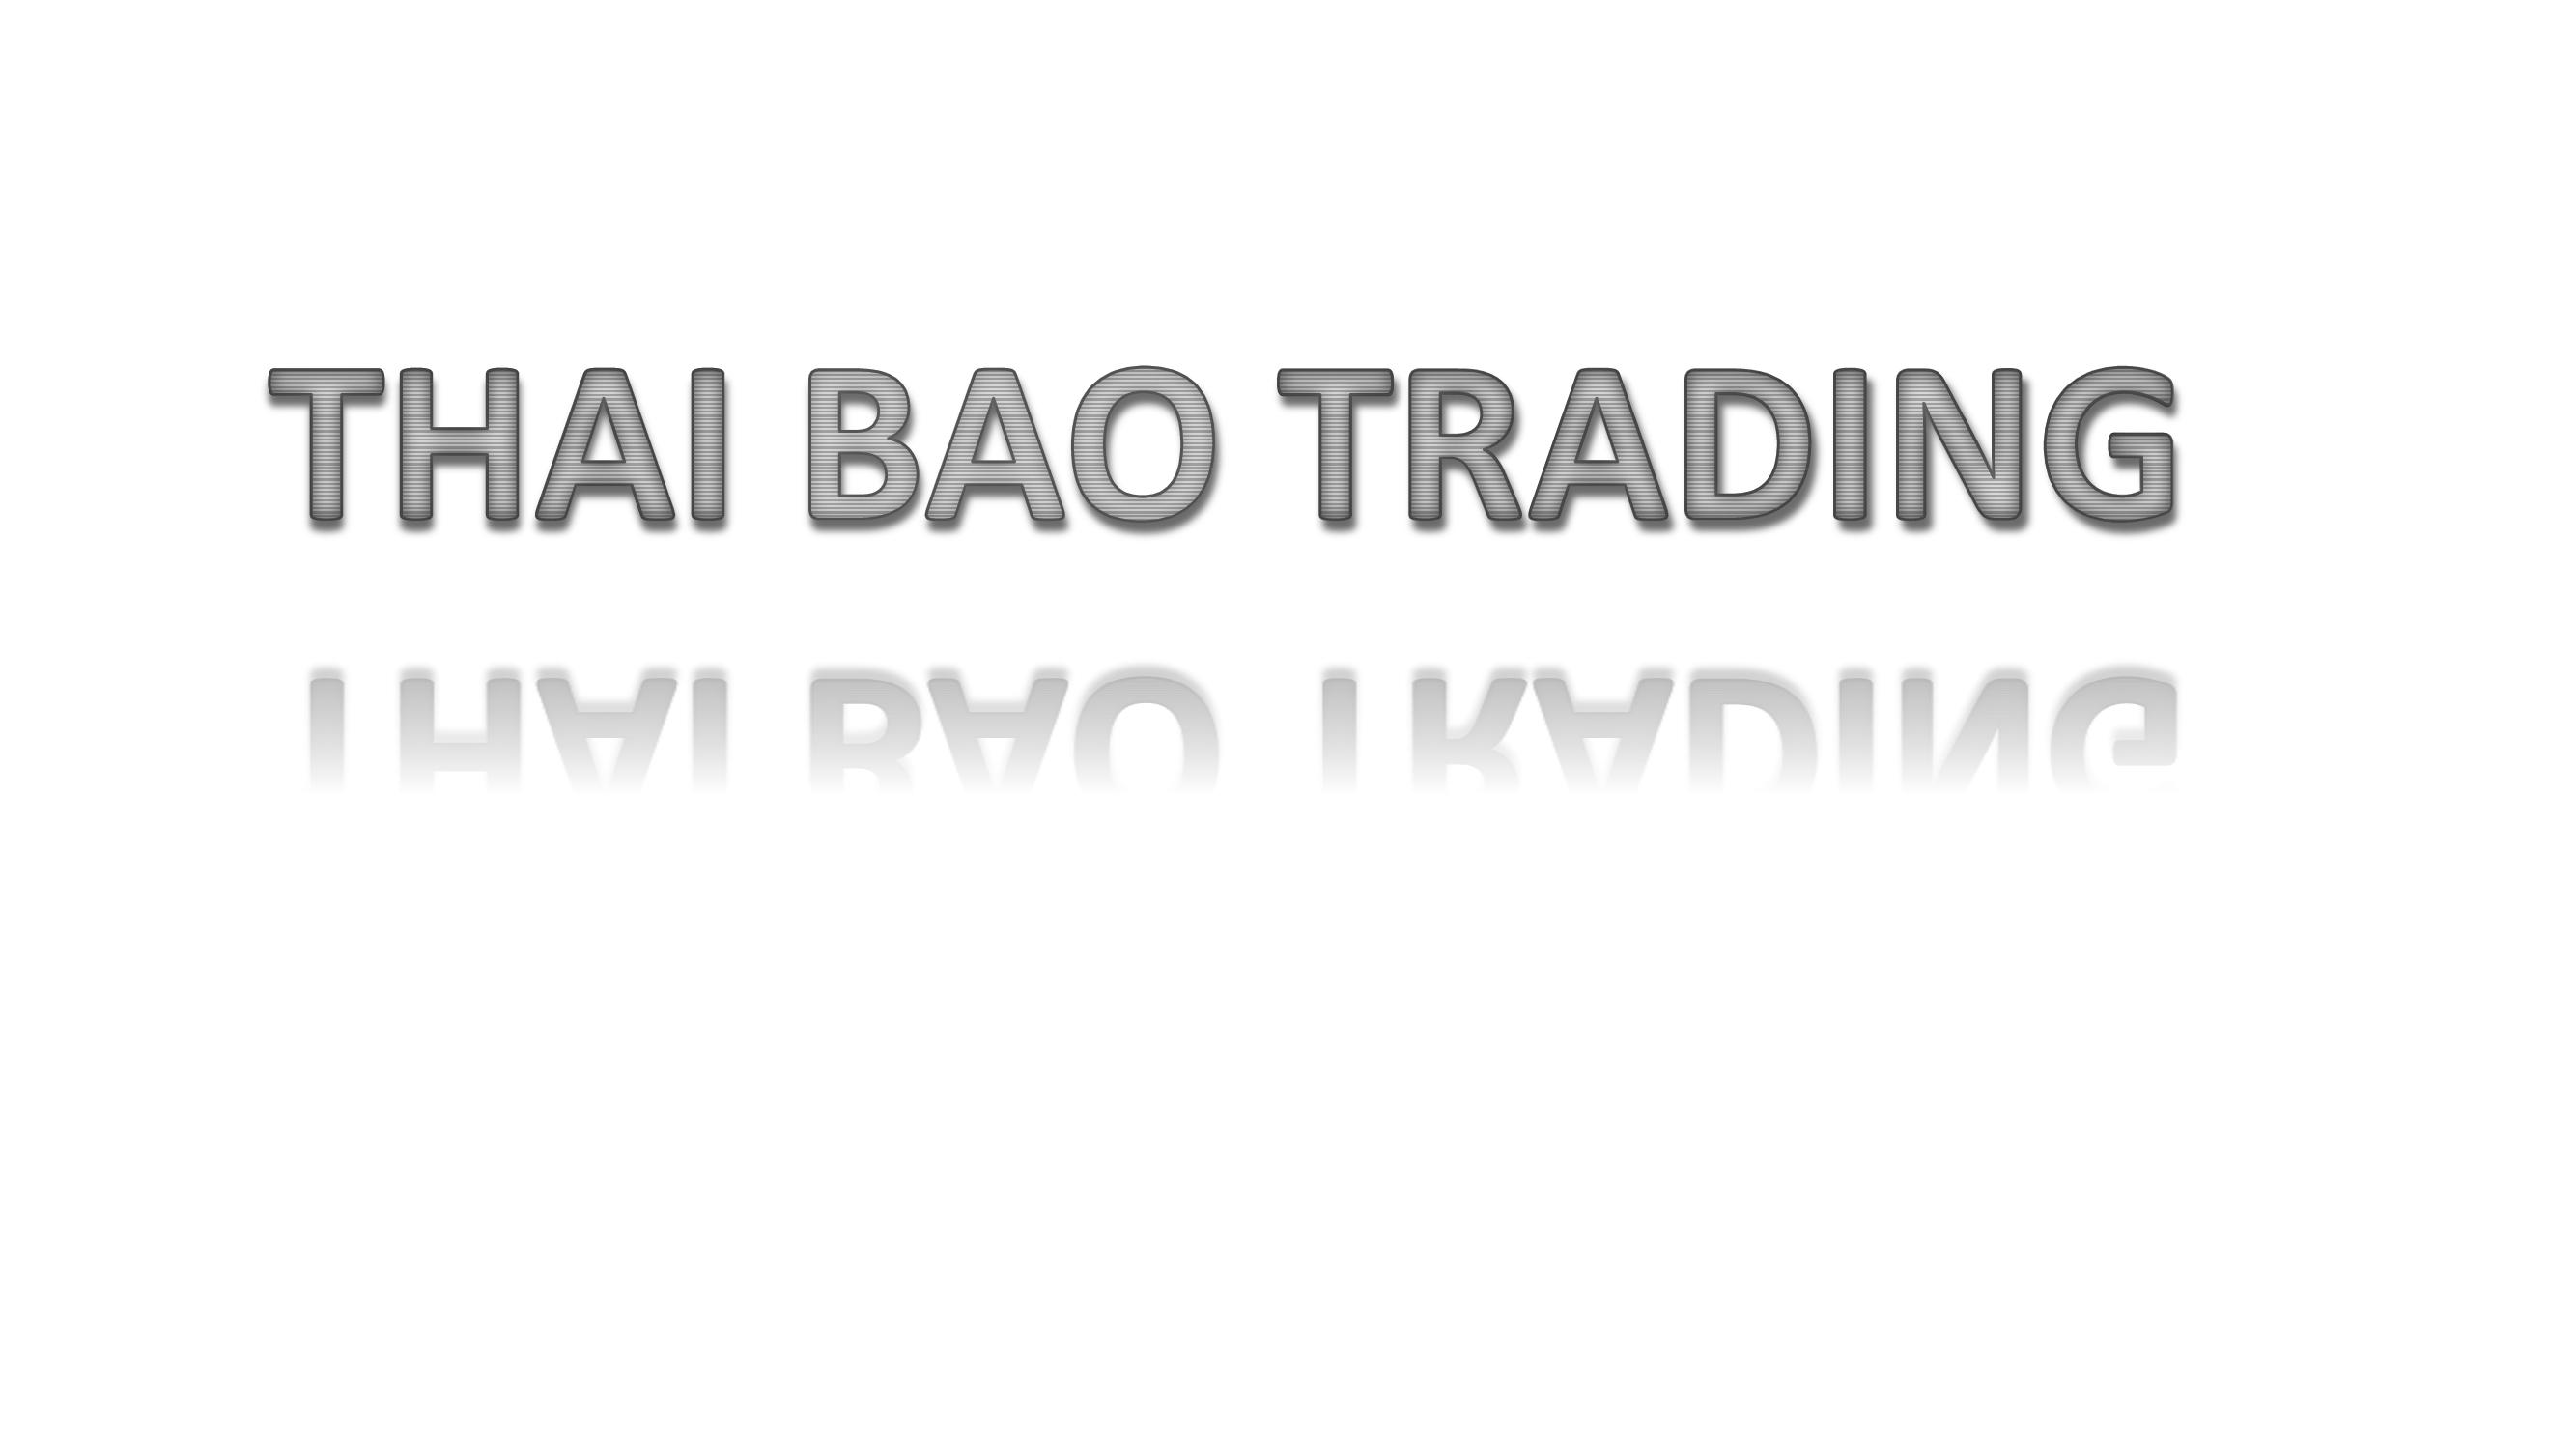 Thaibaotrading